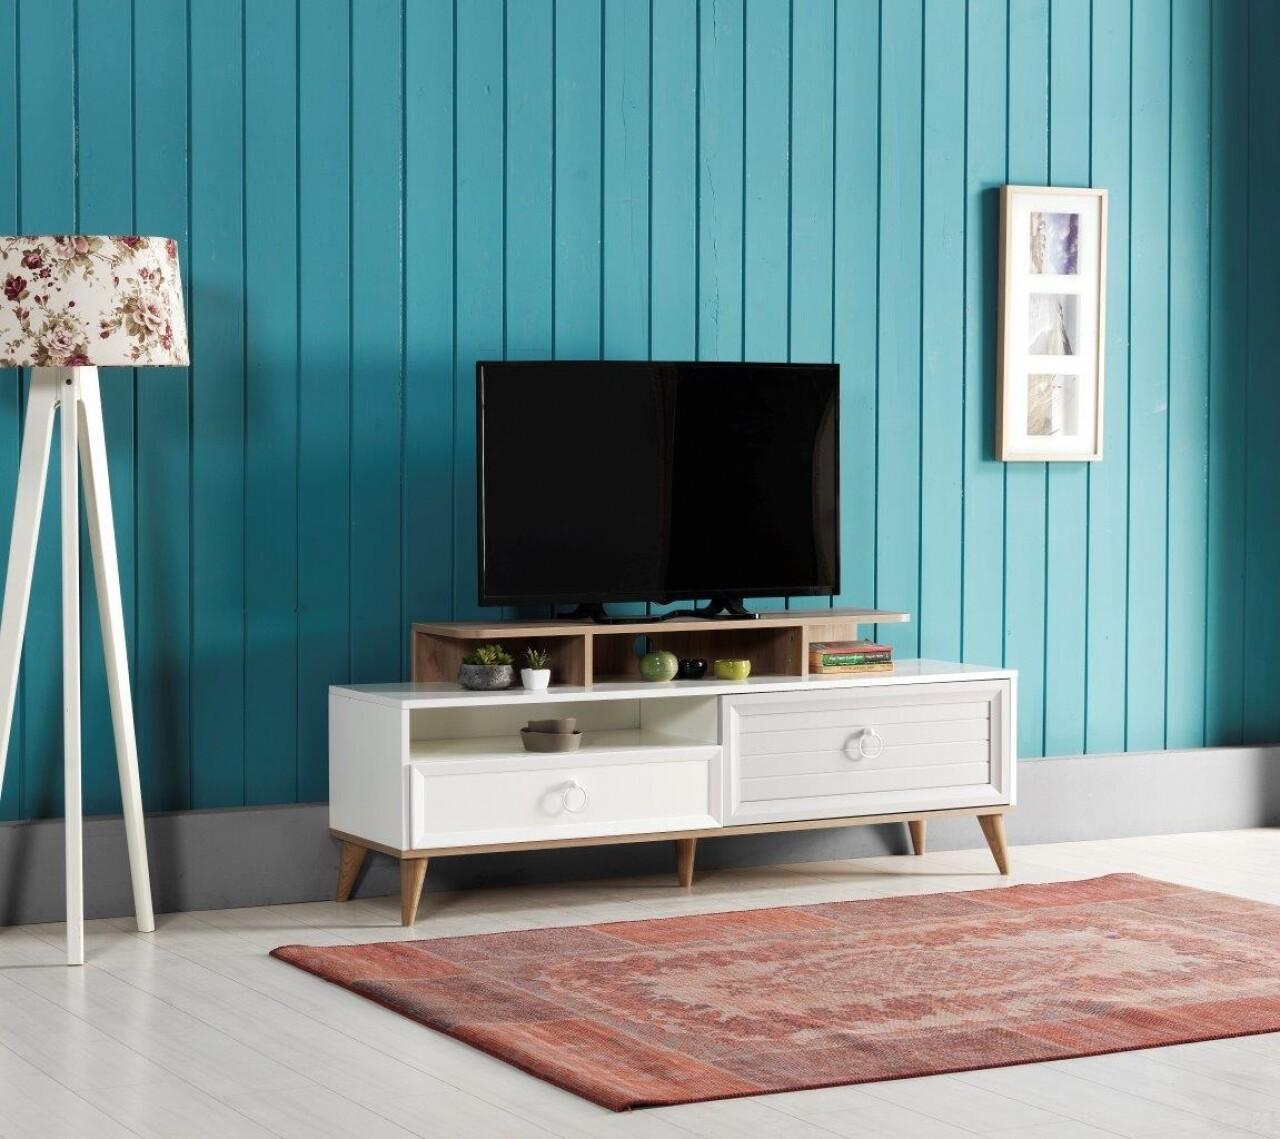 Consola TV Zeta cu 2 sertare, Heinner, 162x43x63 cm, lemn, alb